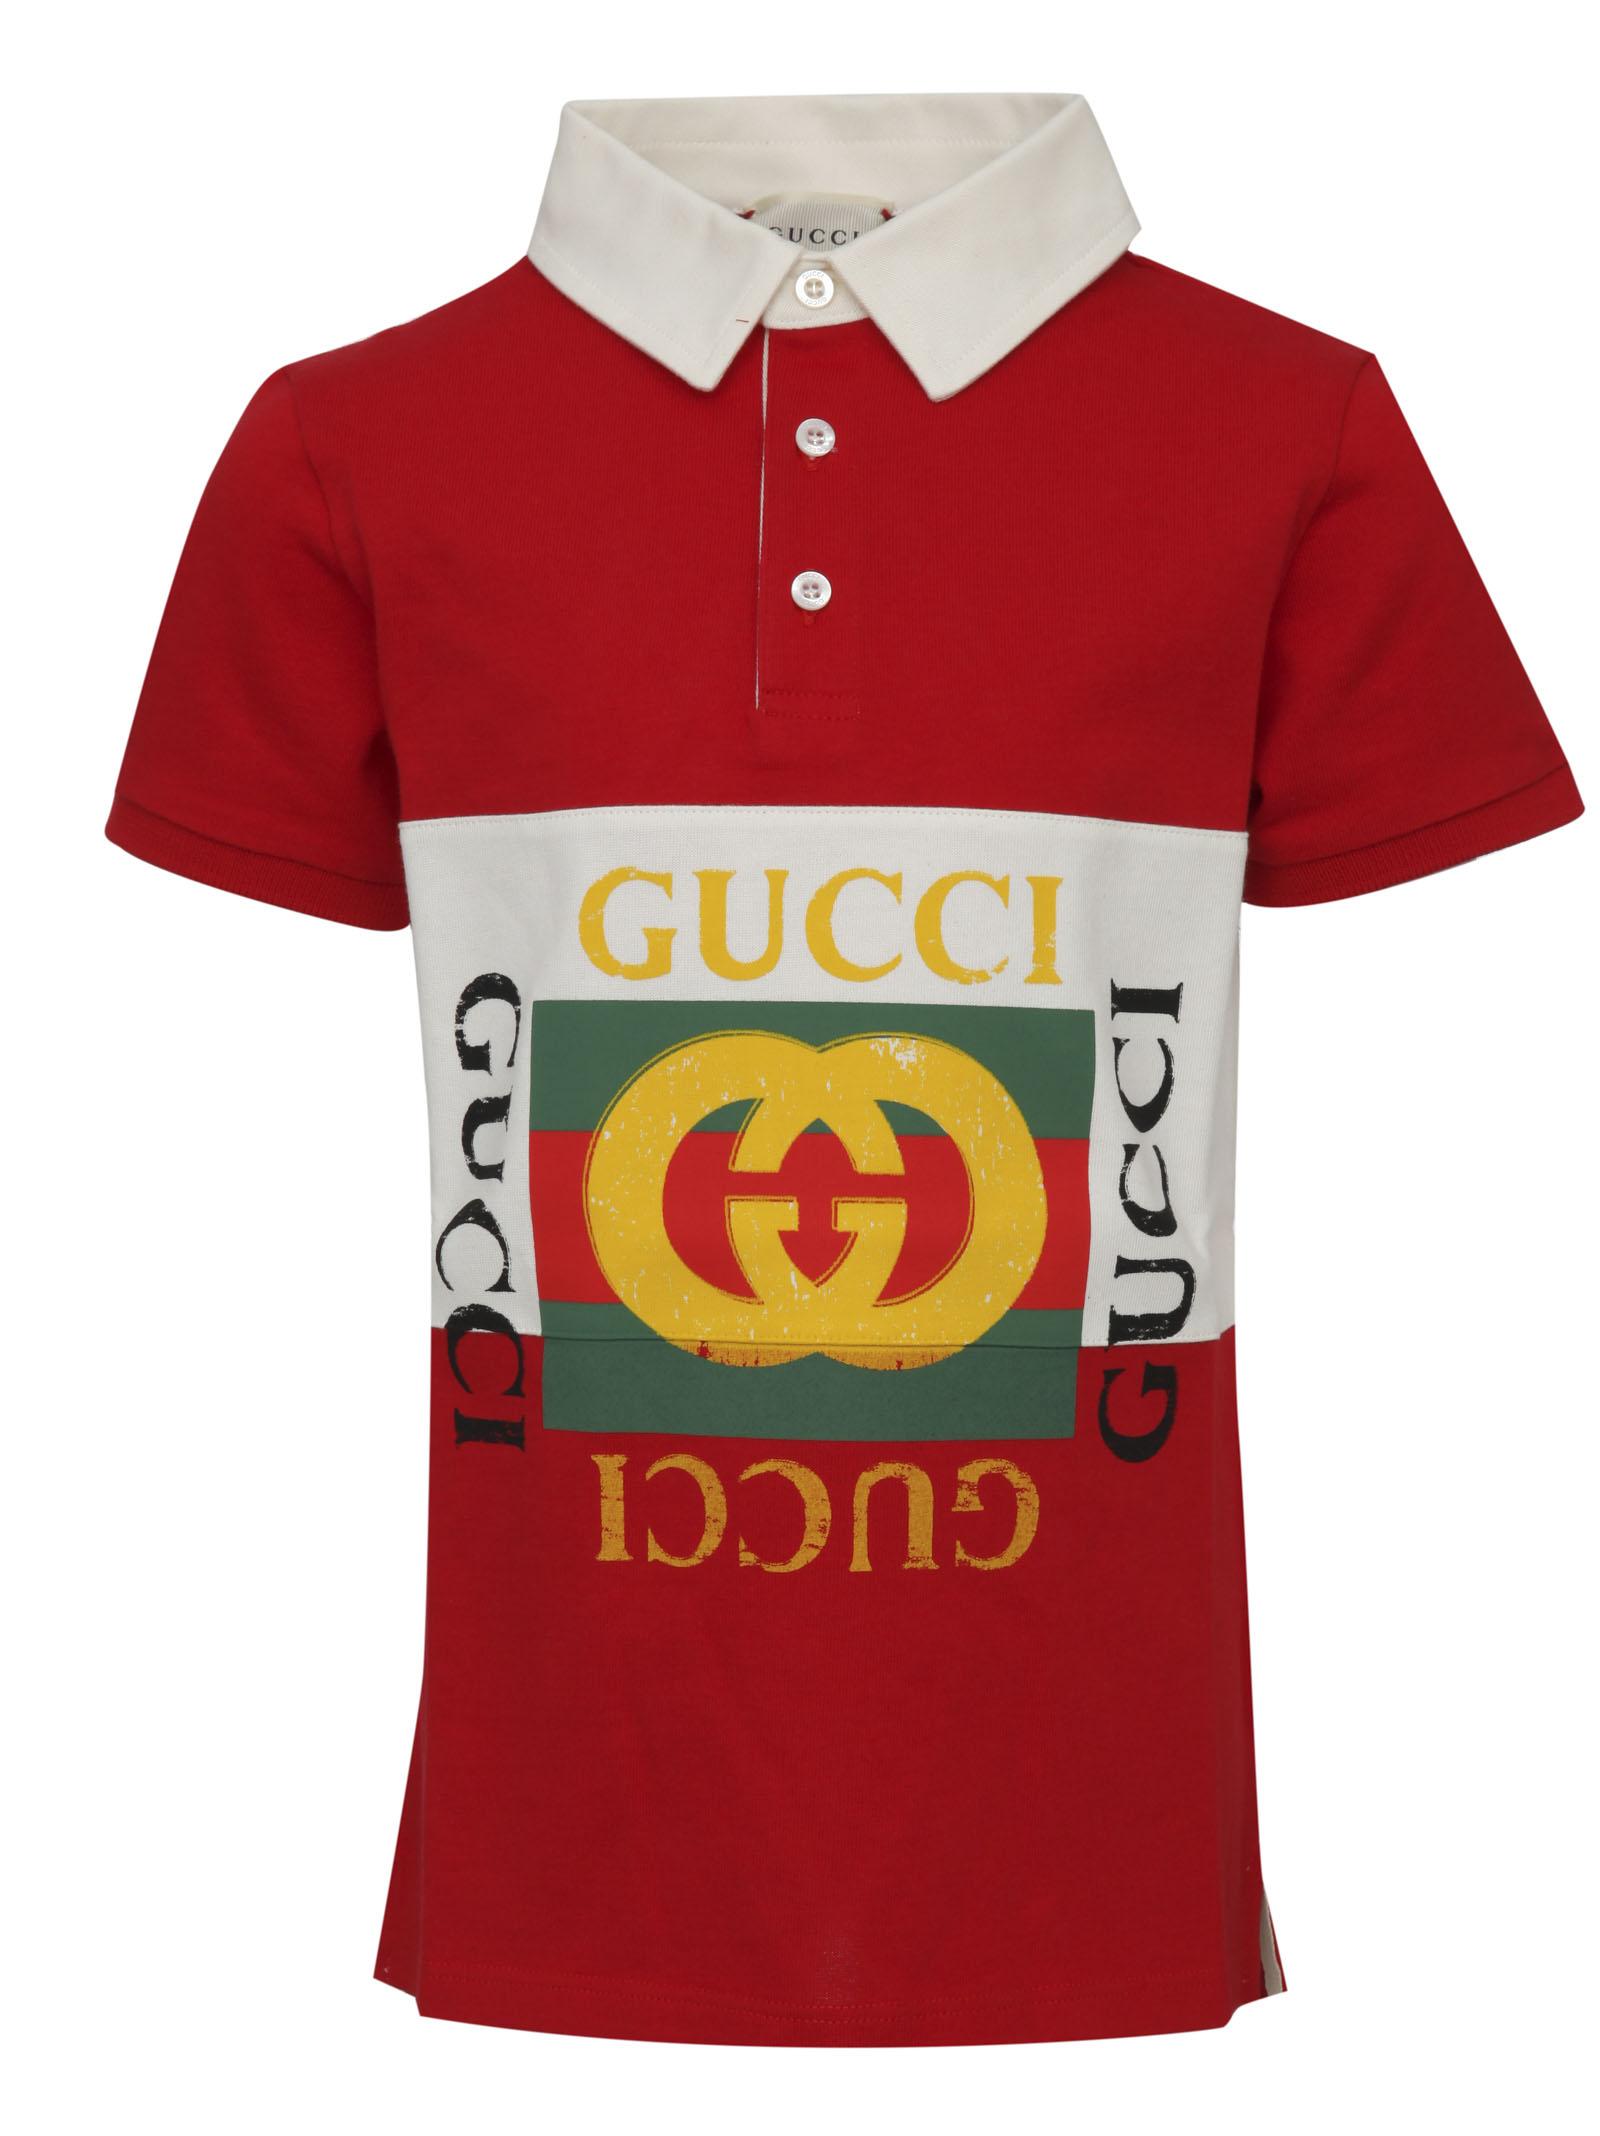 b0a65863 Gucci Junior polo shirt - Gucci Junior - Michele Franzese Moda